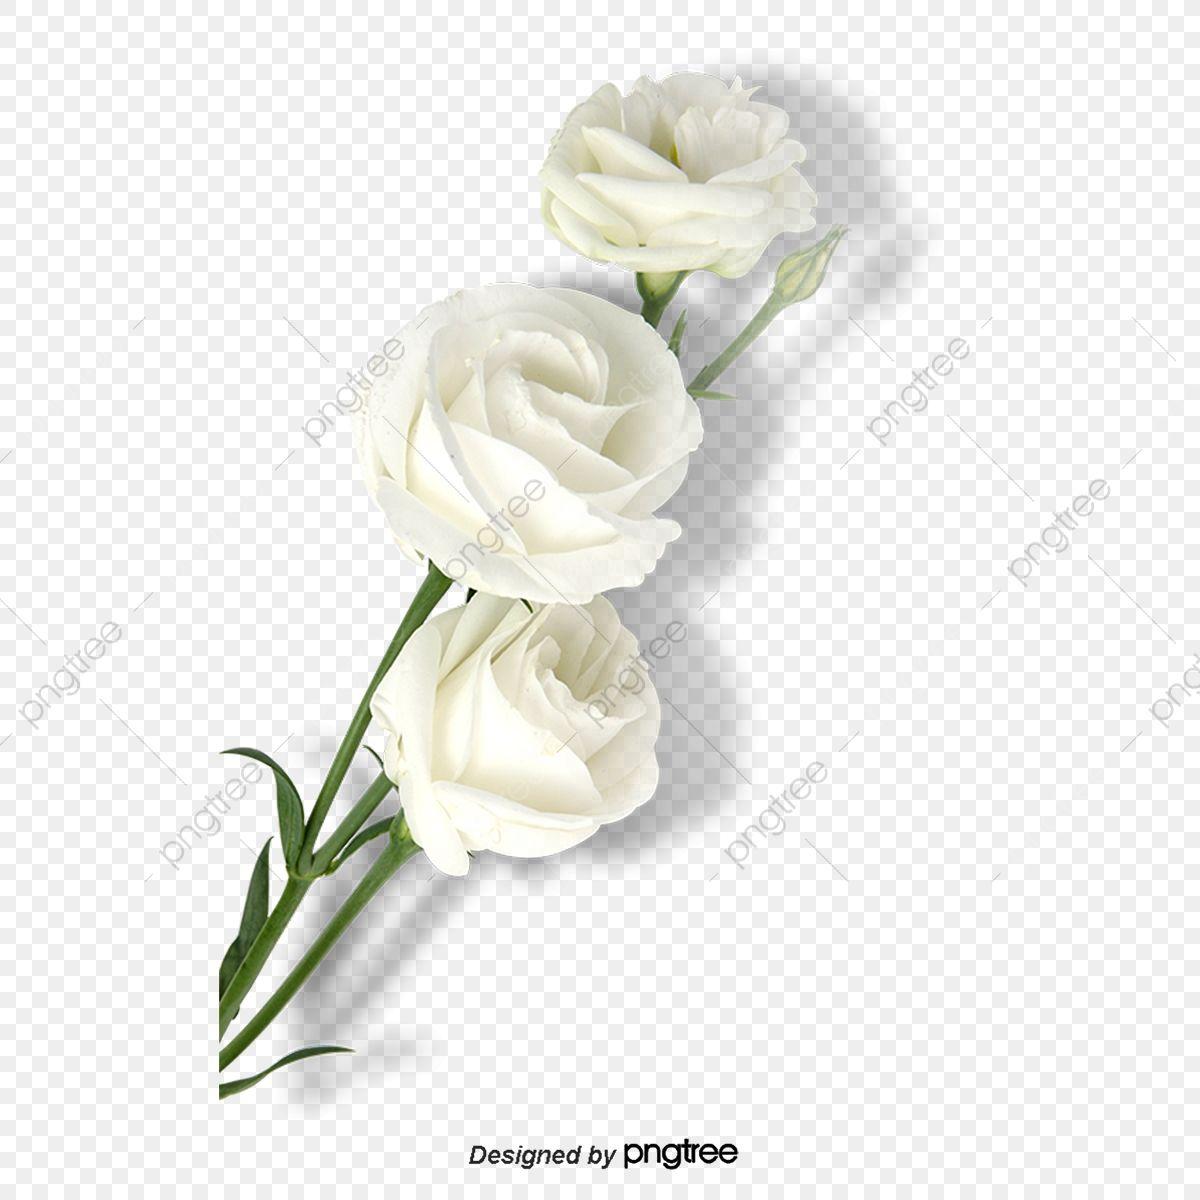 Elemento De Rosa Blanca Del Dia De San Valentin Clipart De Rosas Palido Suave Dia De San Valentin Png Y Psd Para Descargar Gratis Pngtree Rosas Blancas Rosas Flores Exoticas